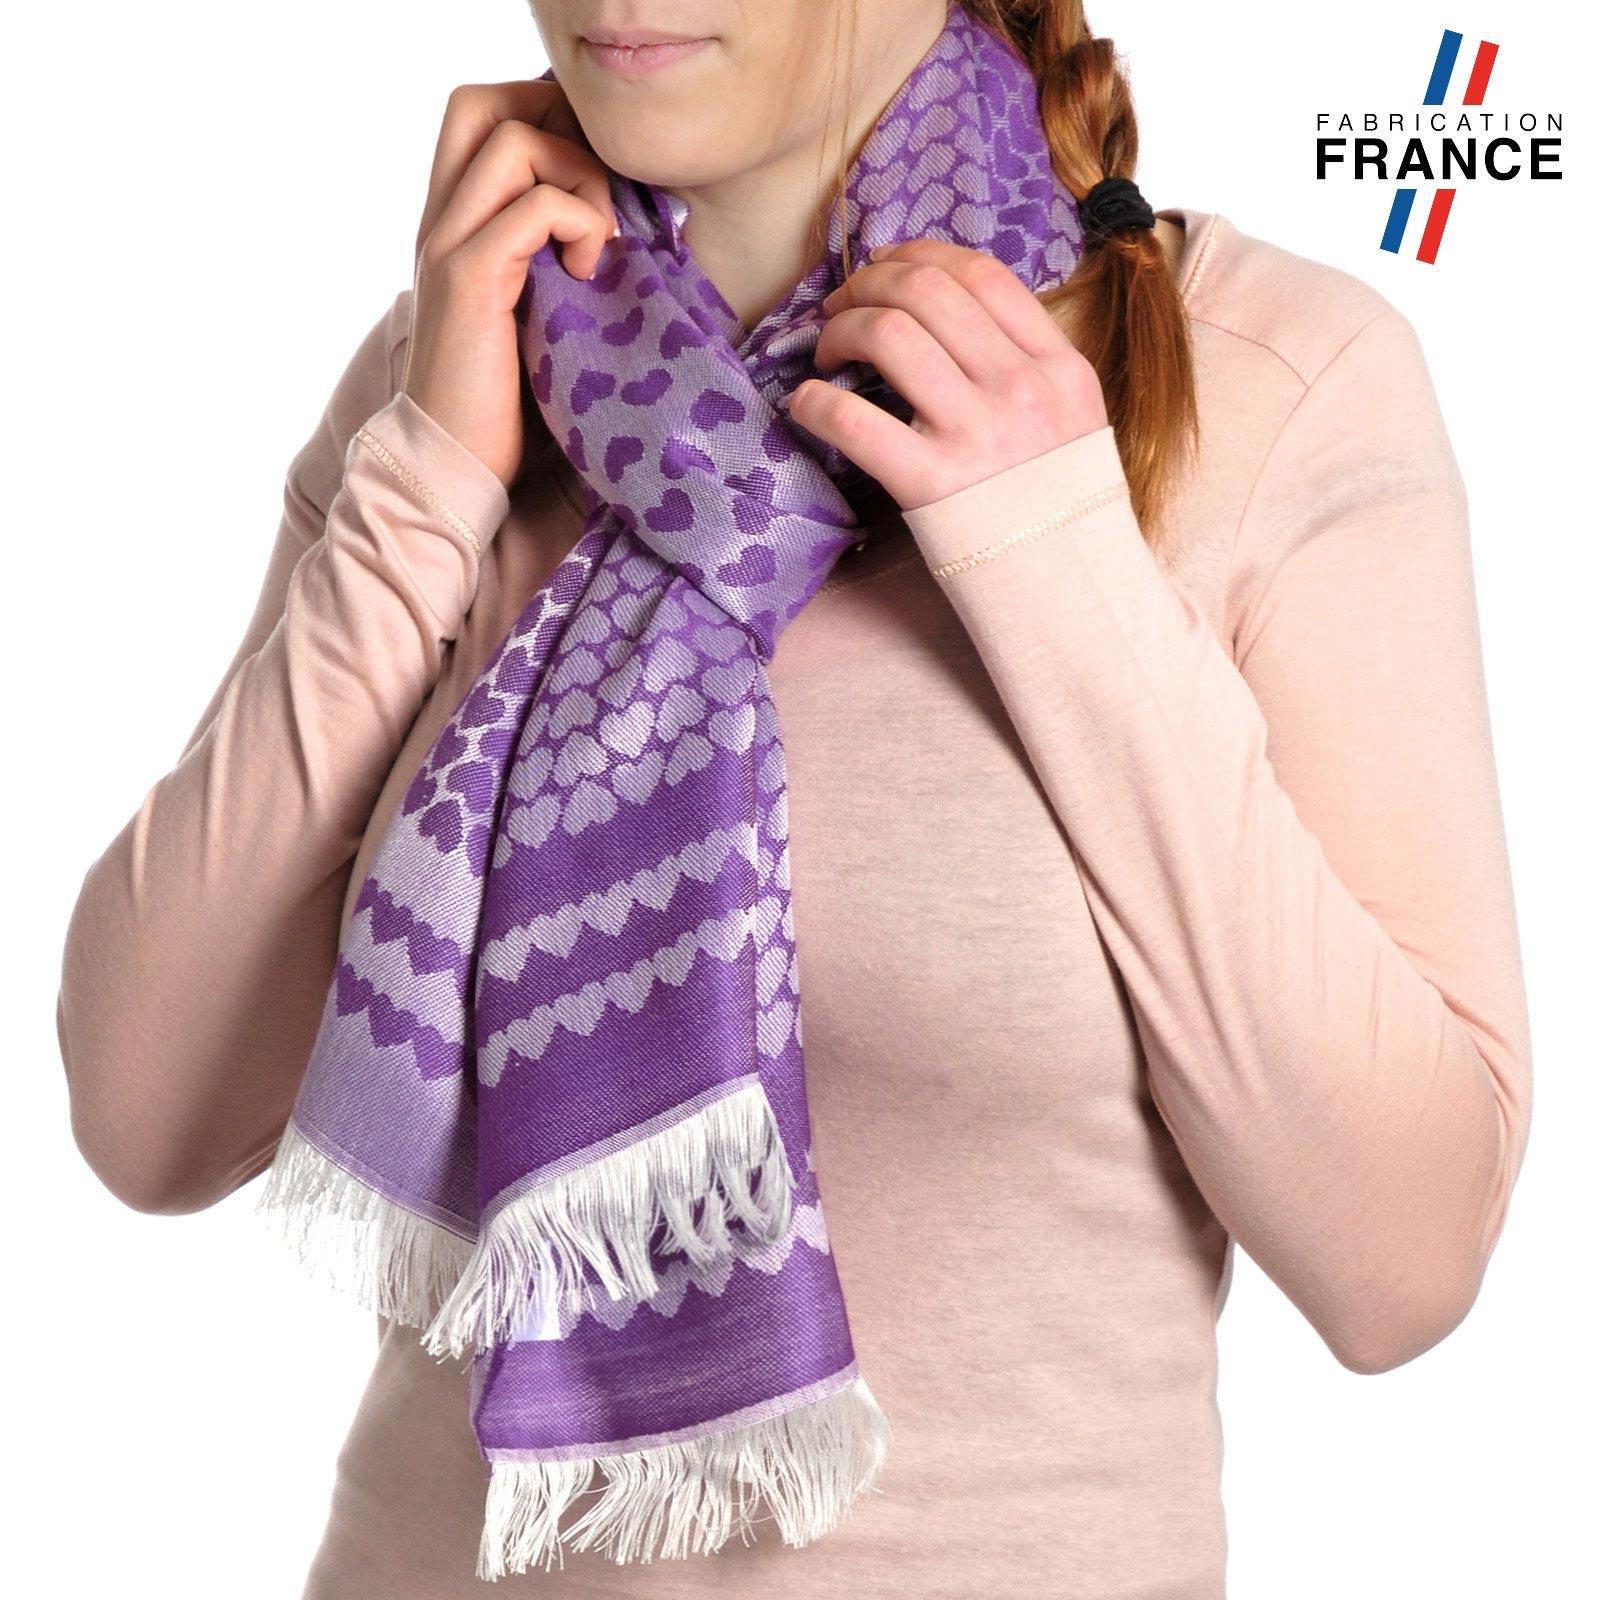 AT-04271-VF10-T-LB_FR-echarpe-qualicoq-motifs-coeurs-violet